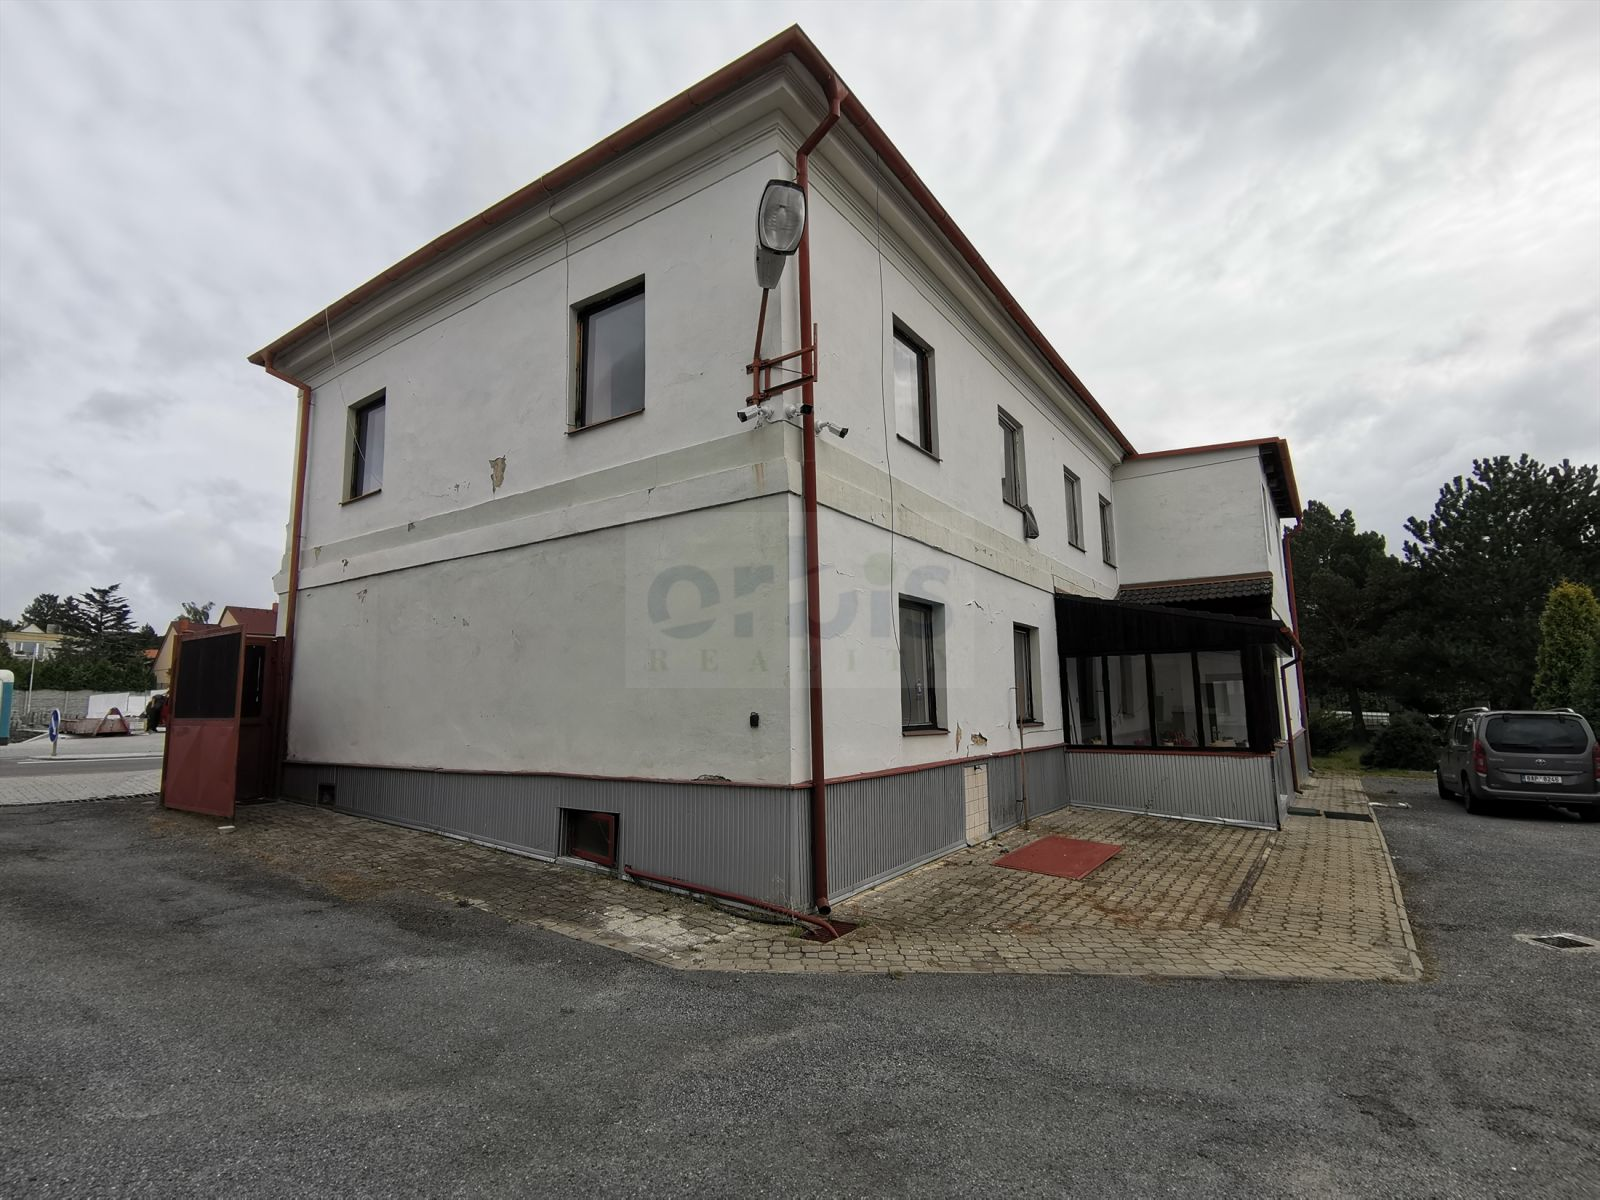 Pronájem nebytového prostoru o velikosti 90 m2 Stochov Slovanka